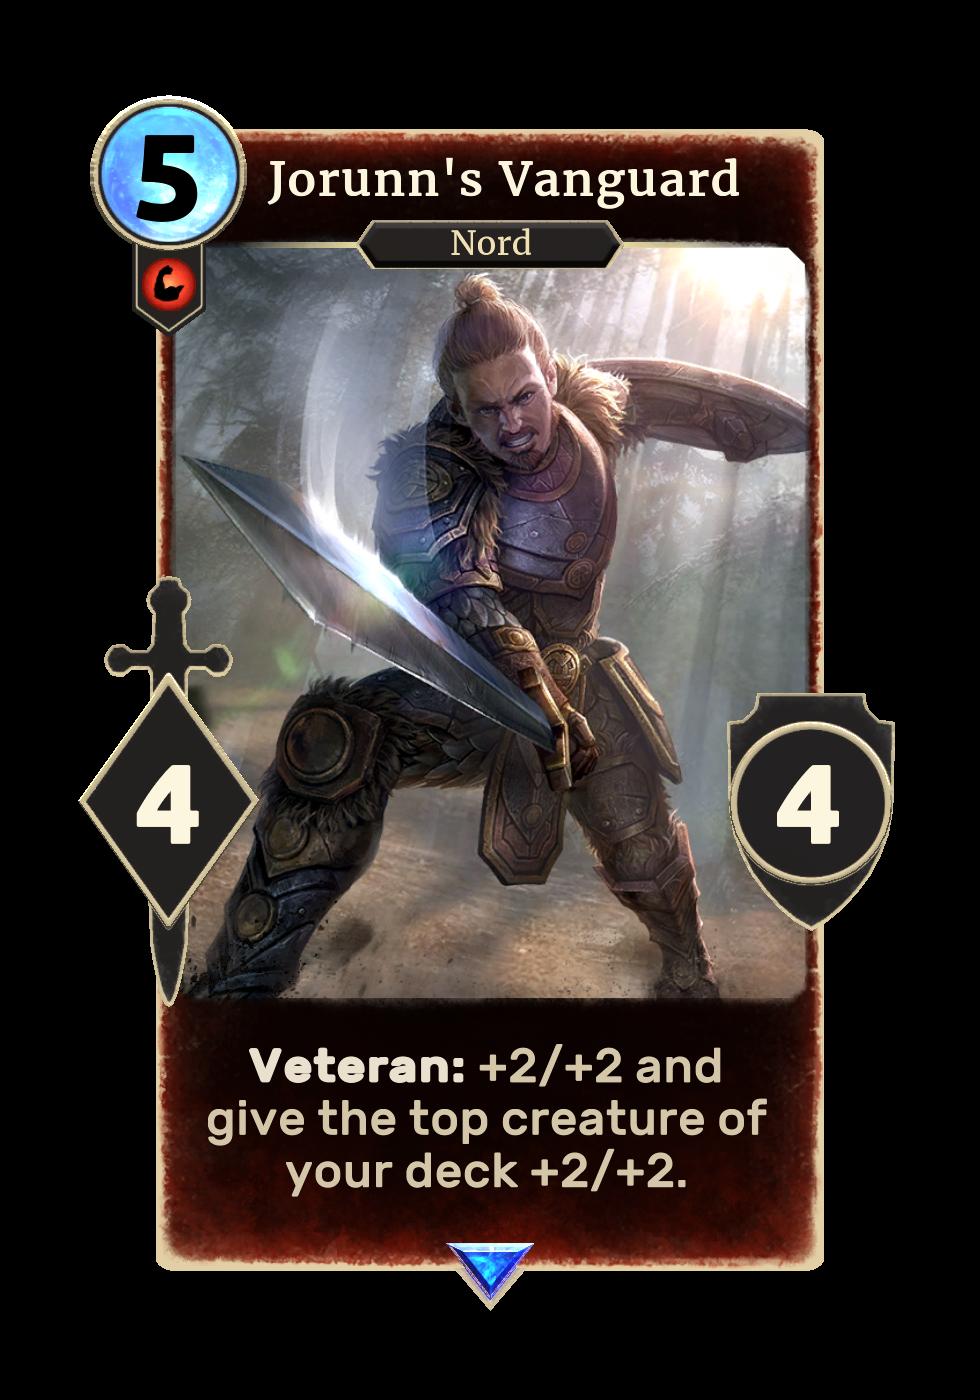 Jorunn's Vanguard